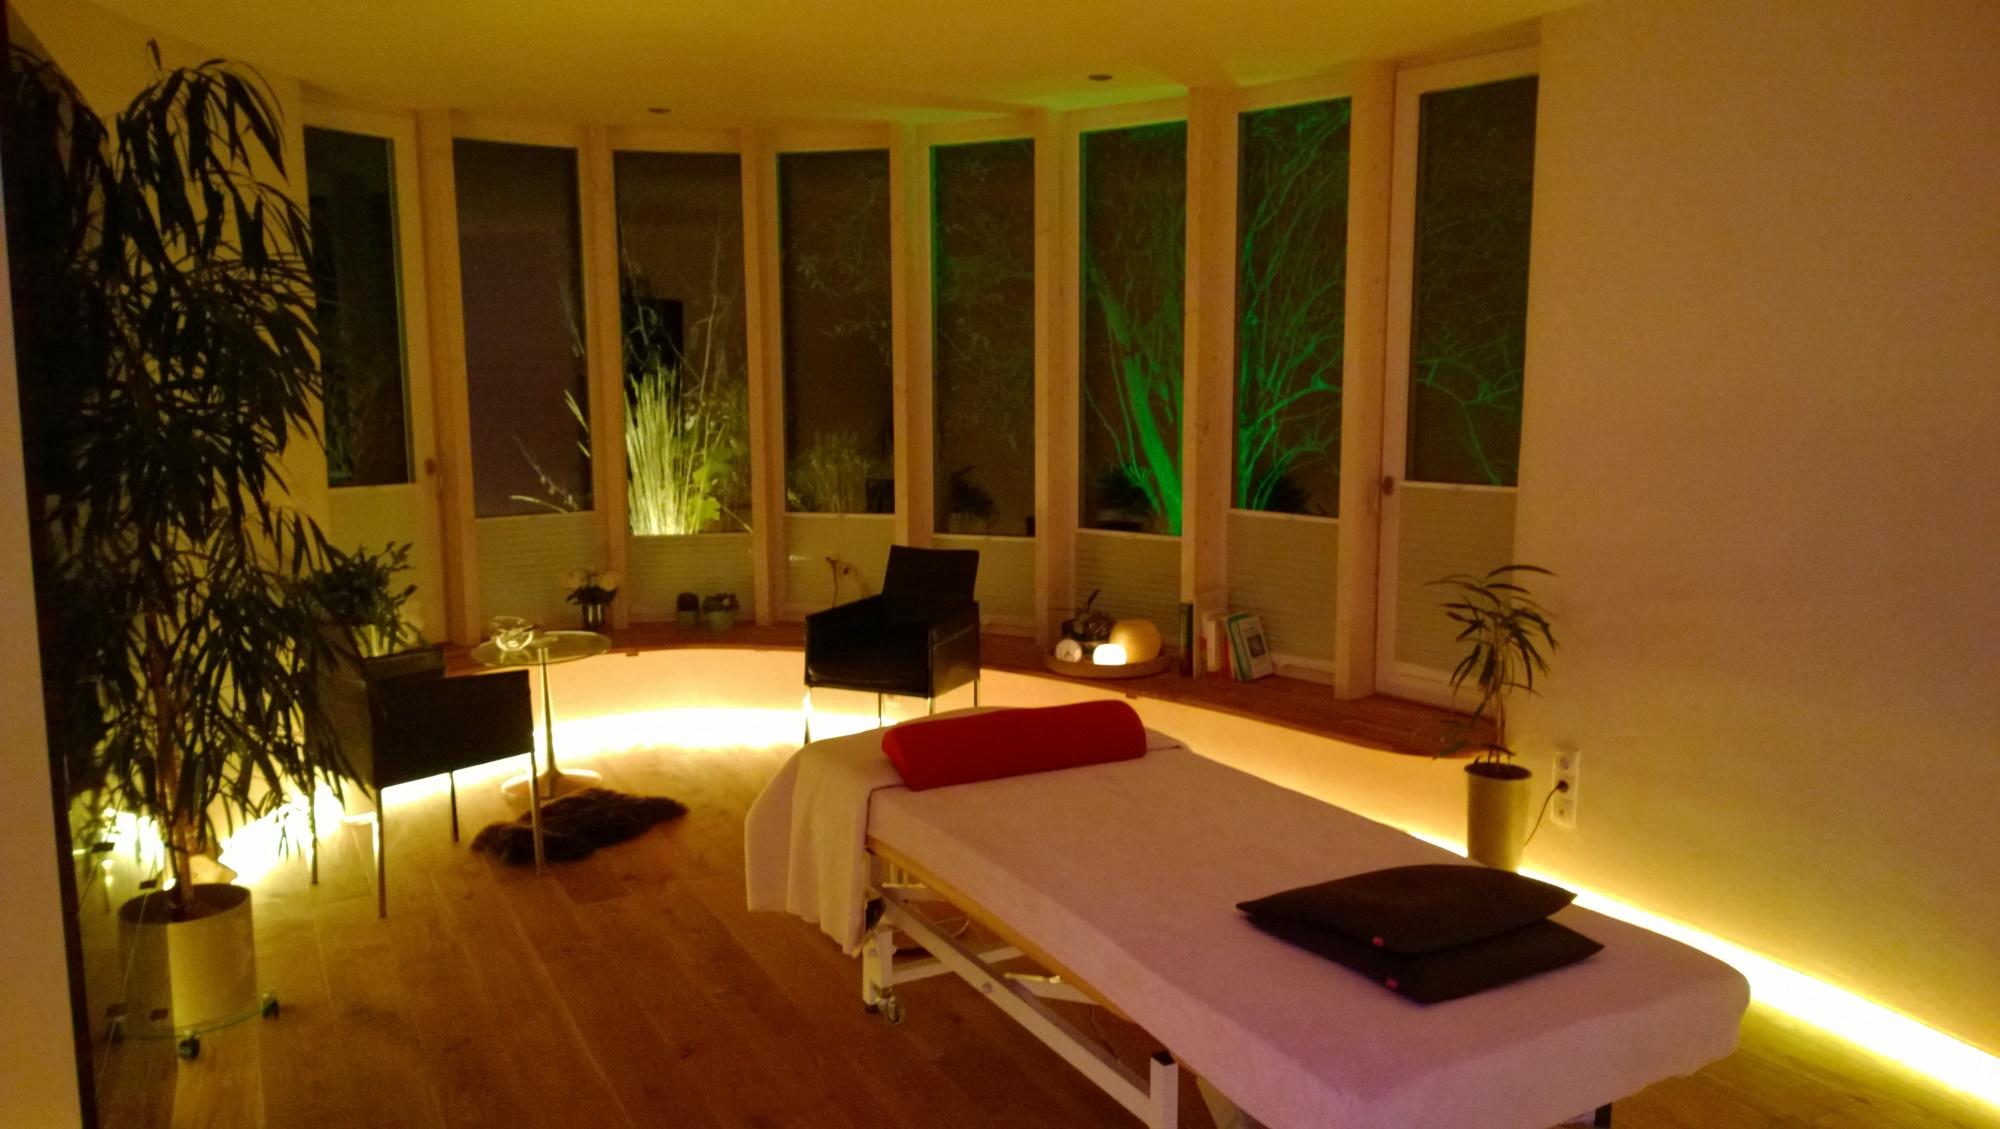 Behandlungsraum bei Nacht